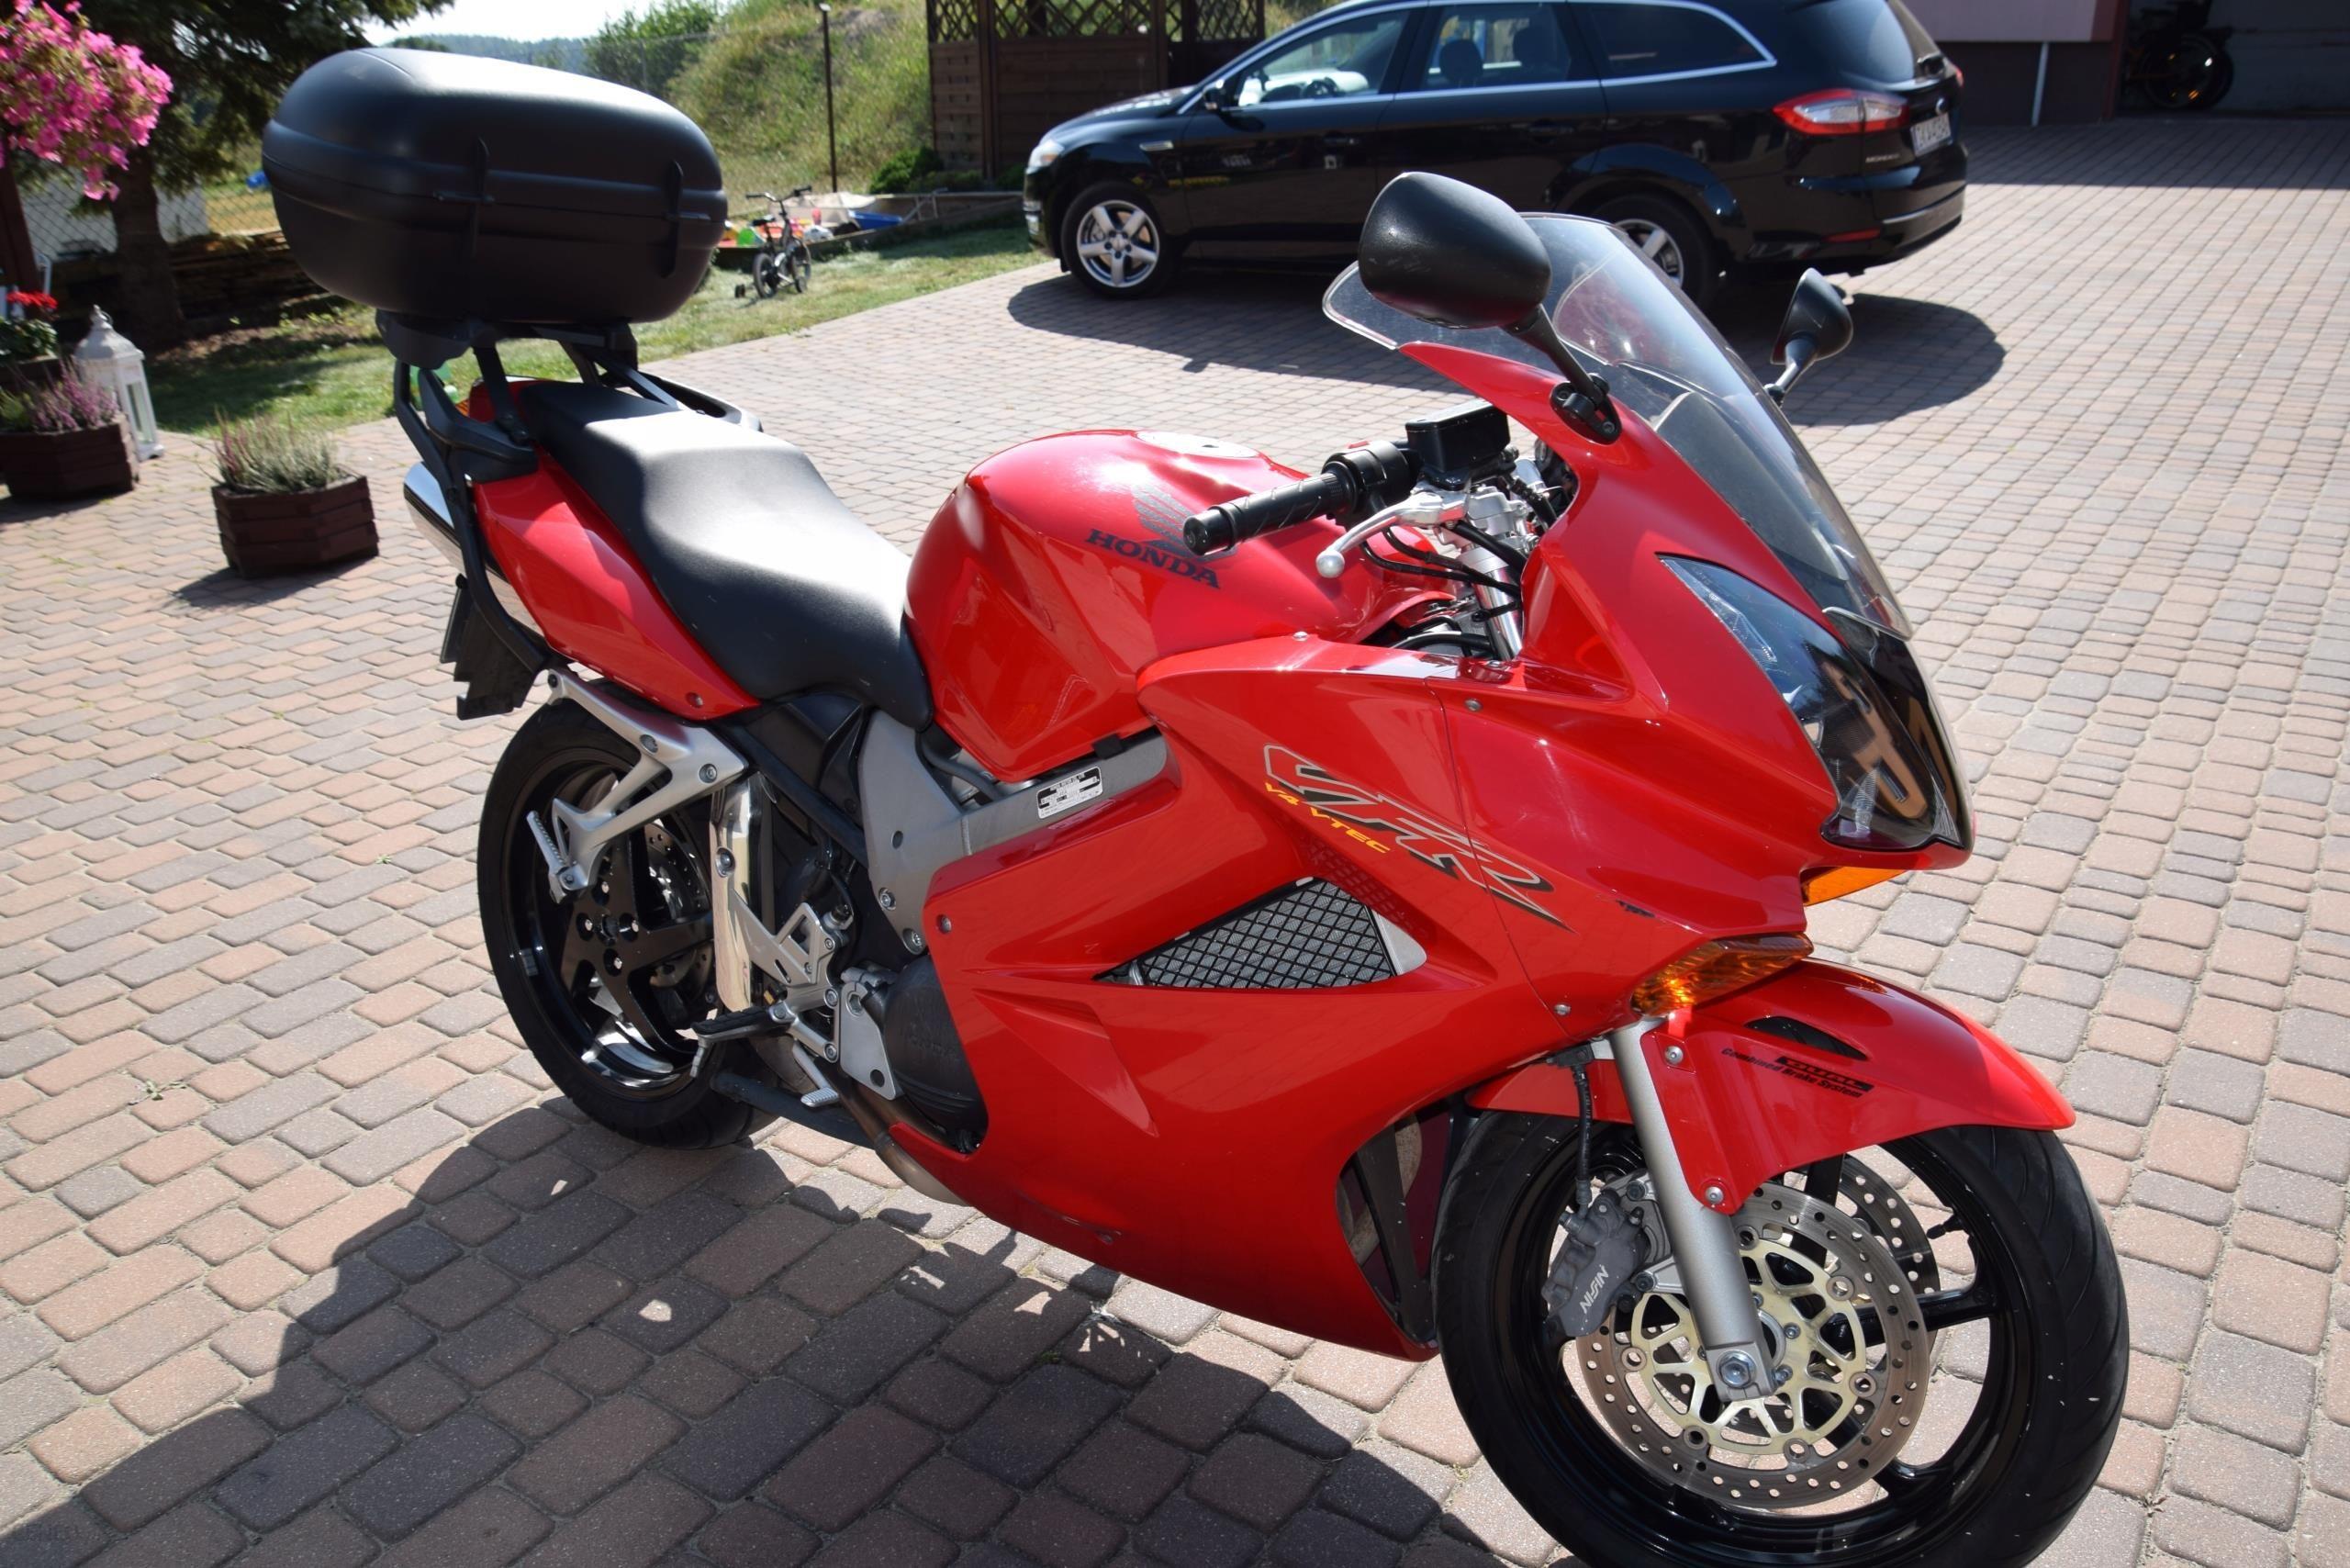 Motocykl Honda Vfr 800 V Tec Opinie I Ceny Na Ceneo Pl